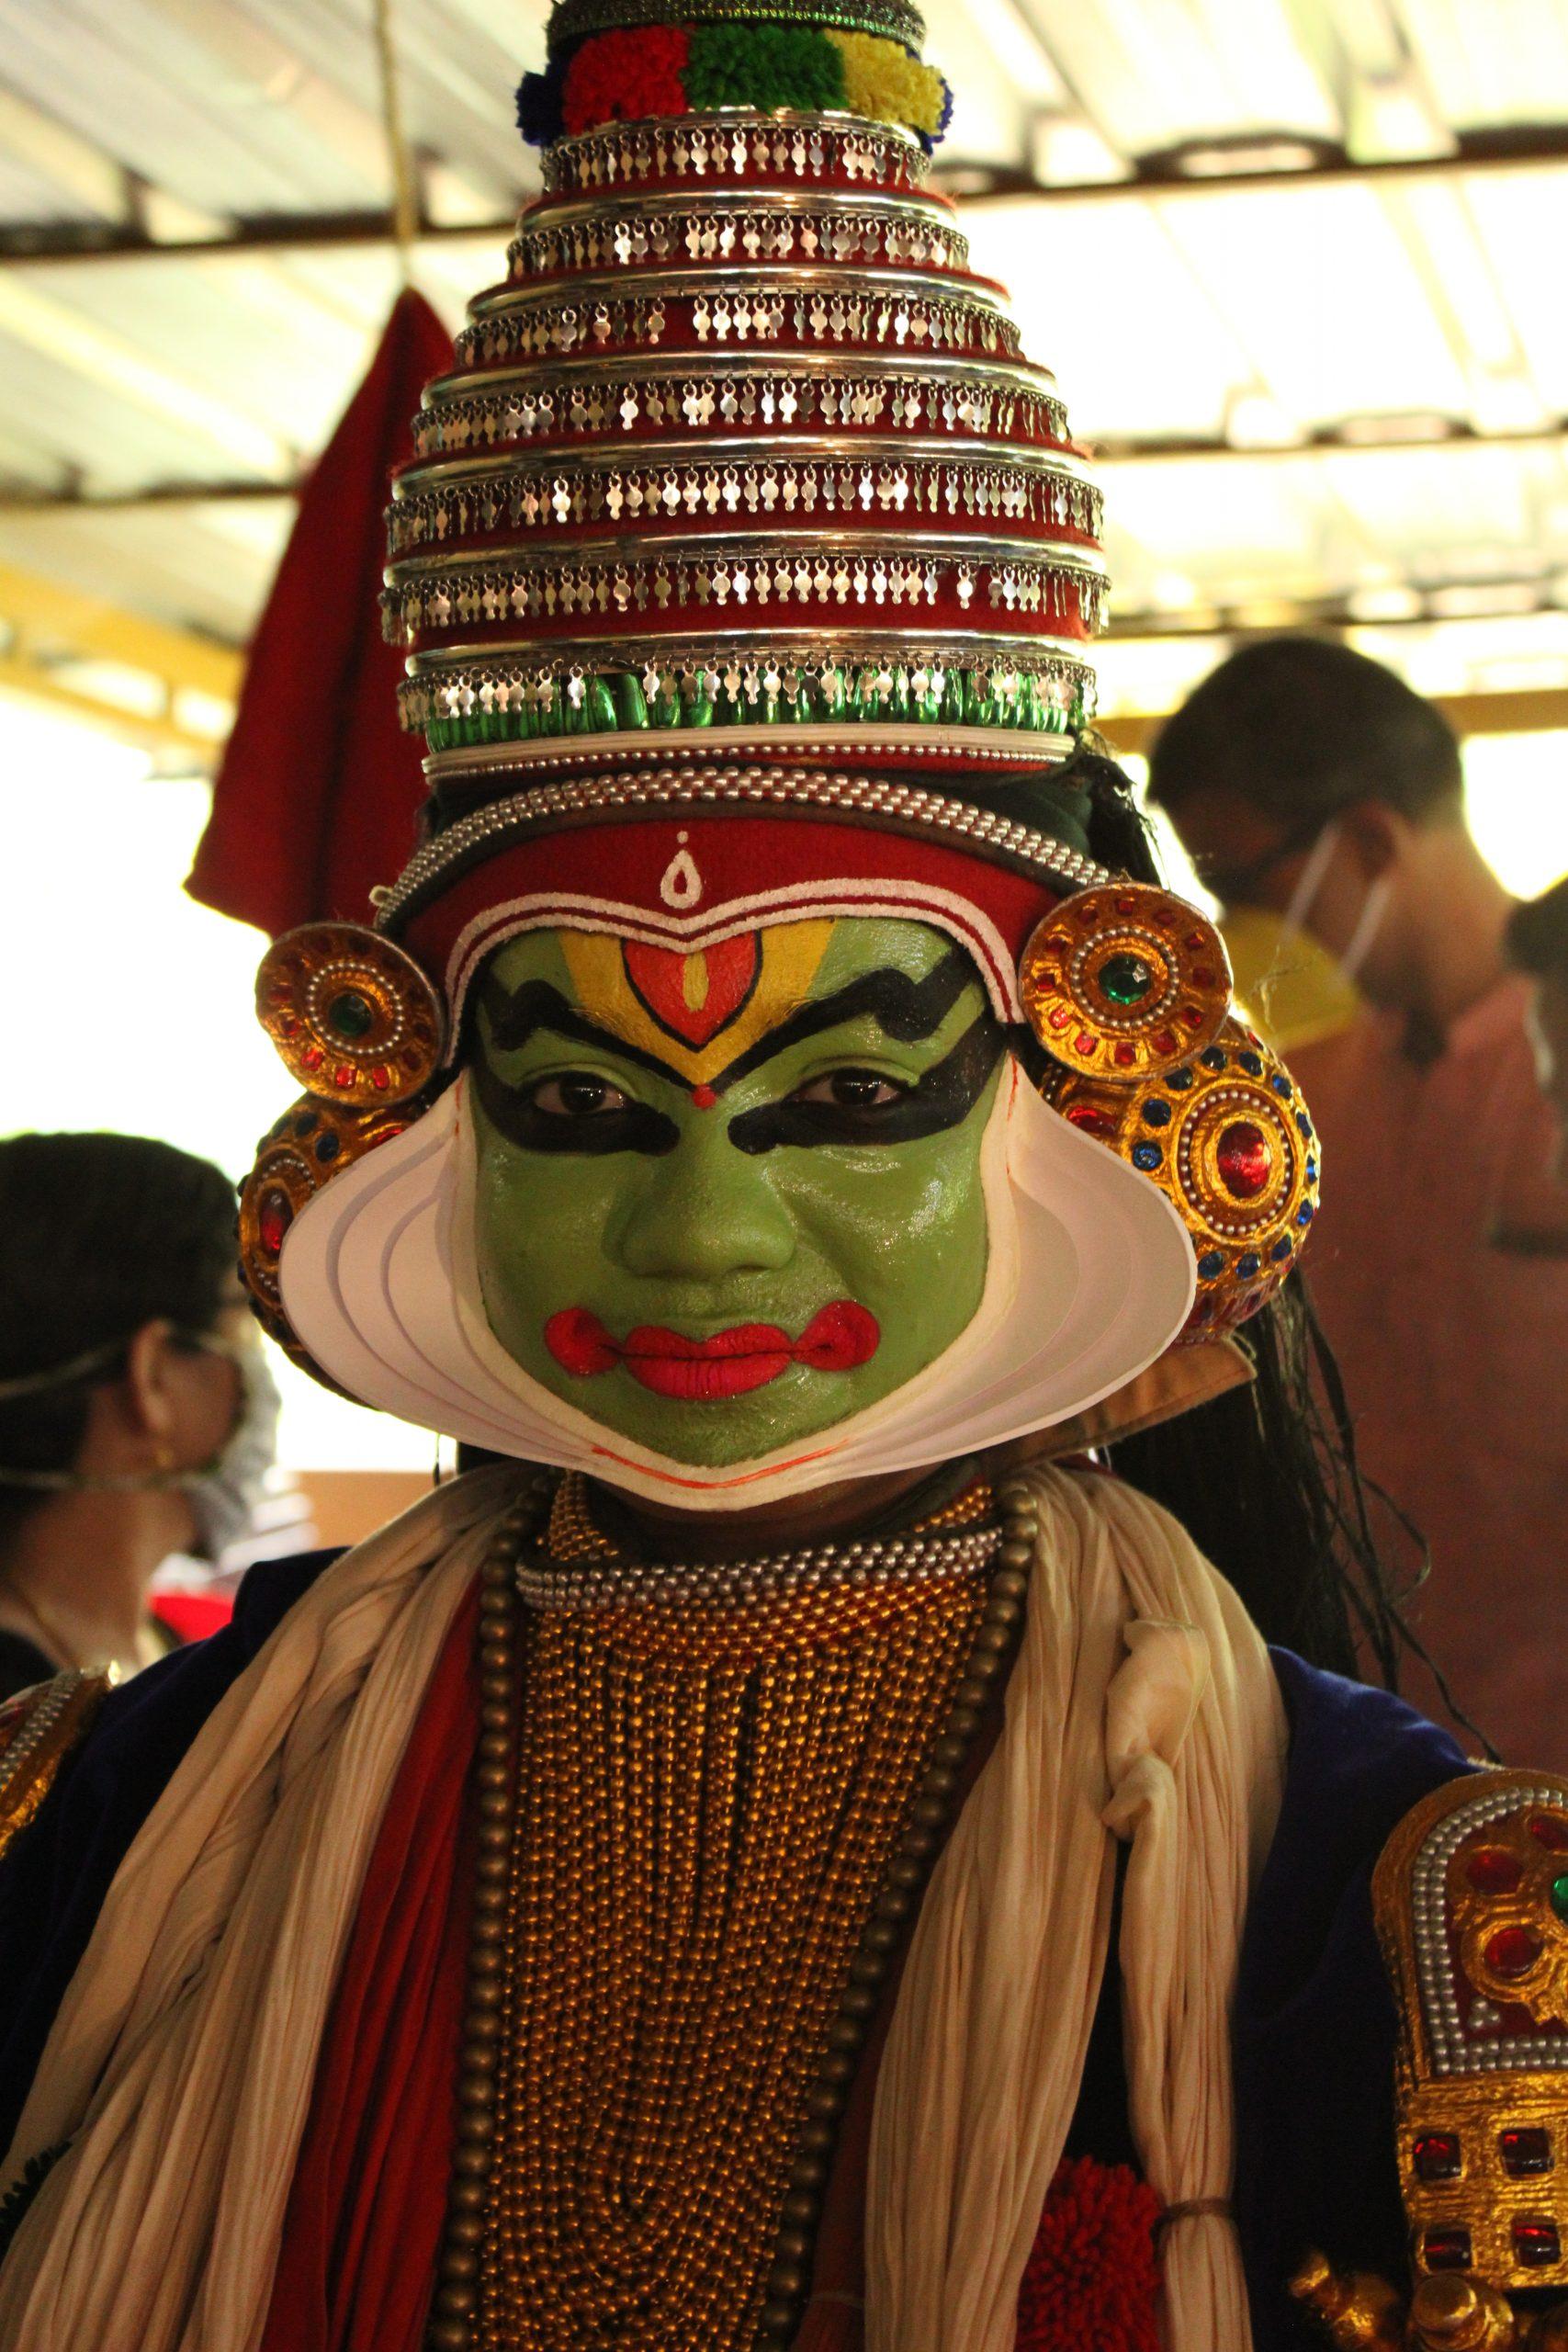 A portrait of a kathakali dancer